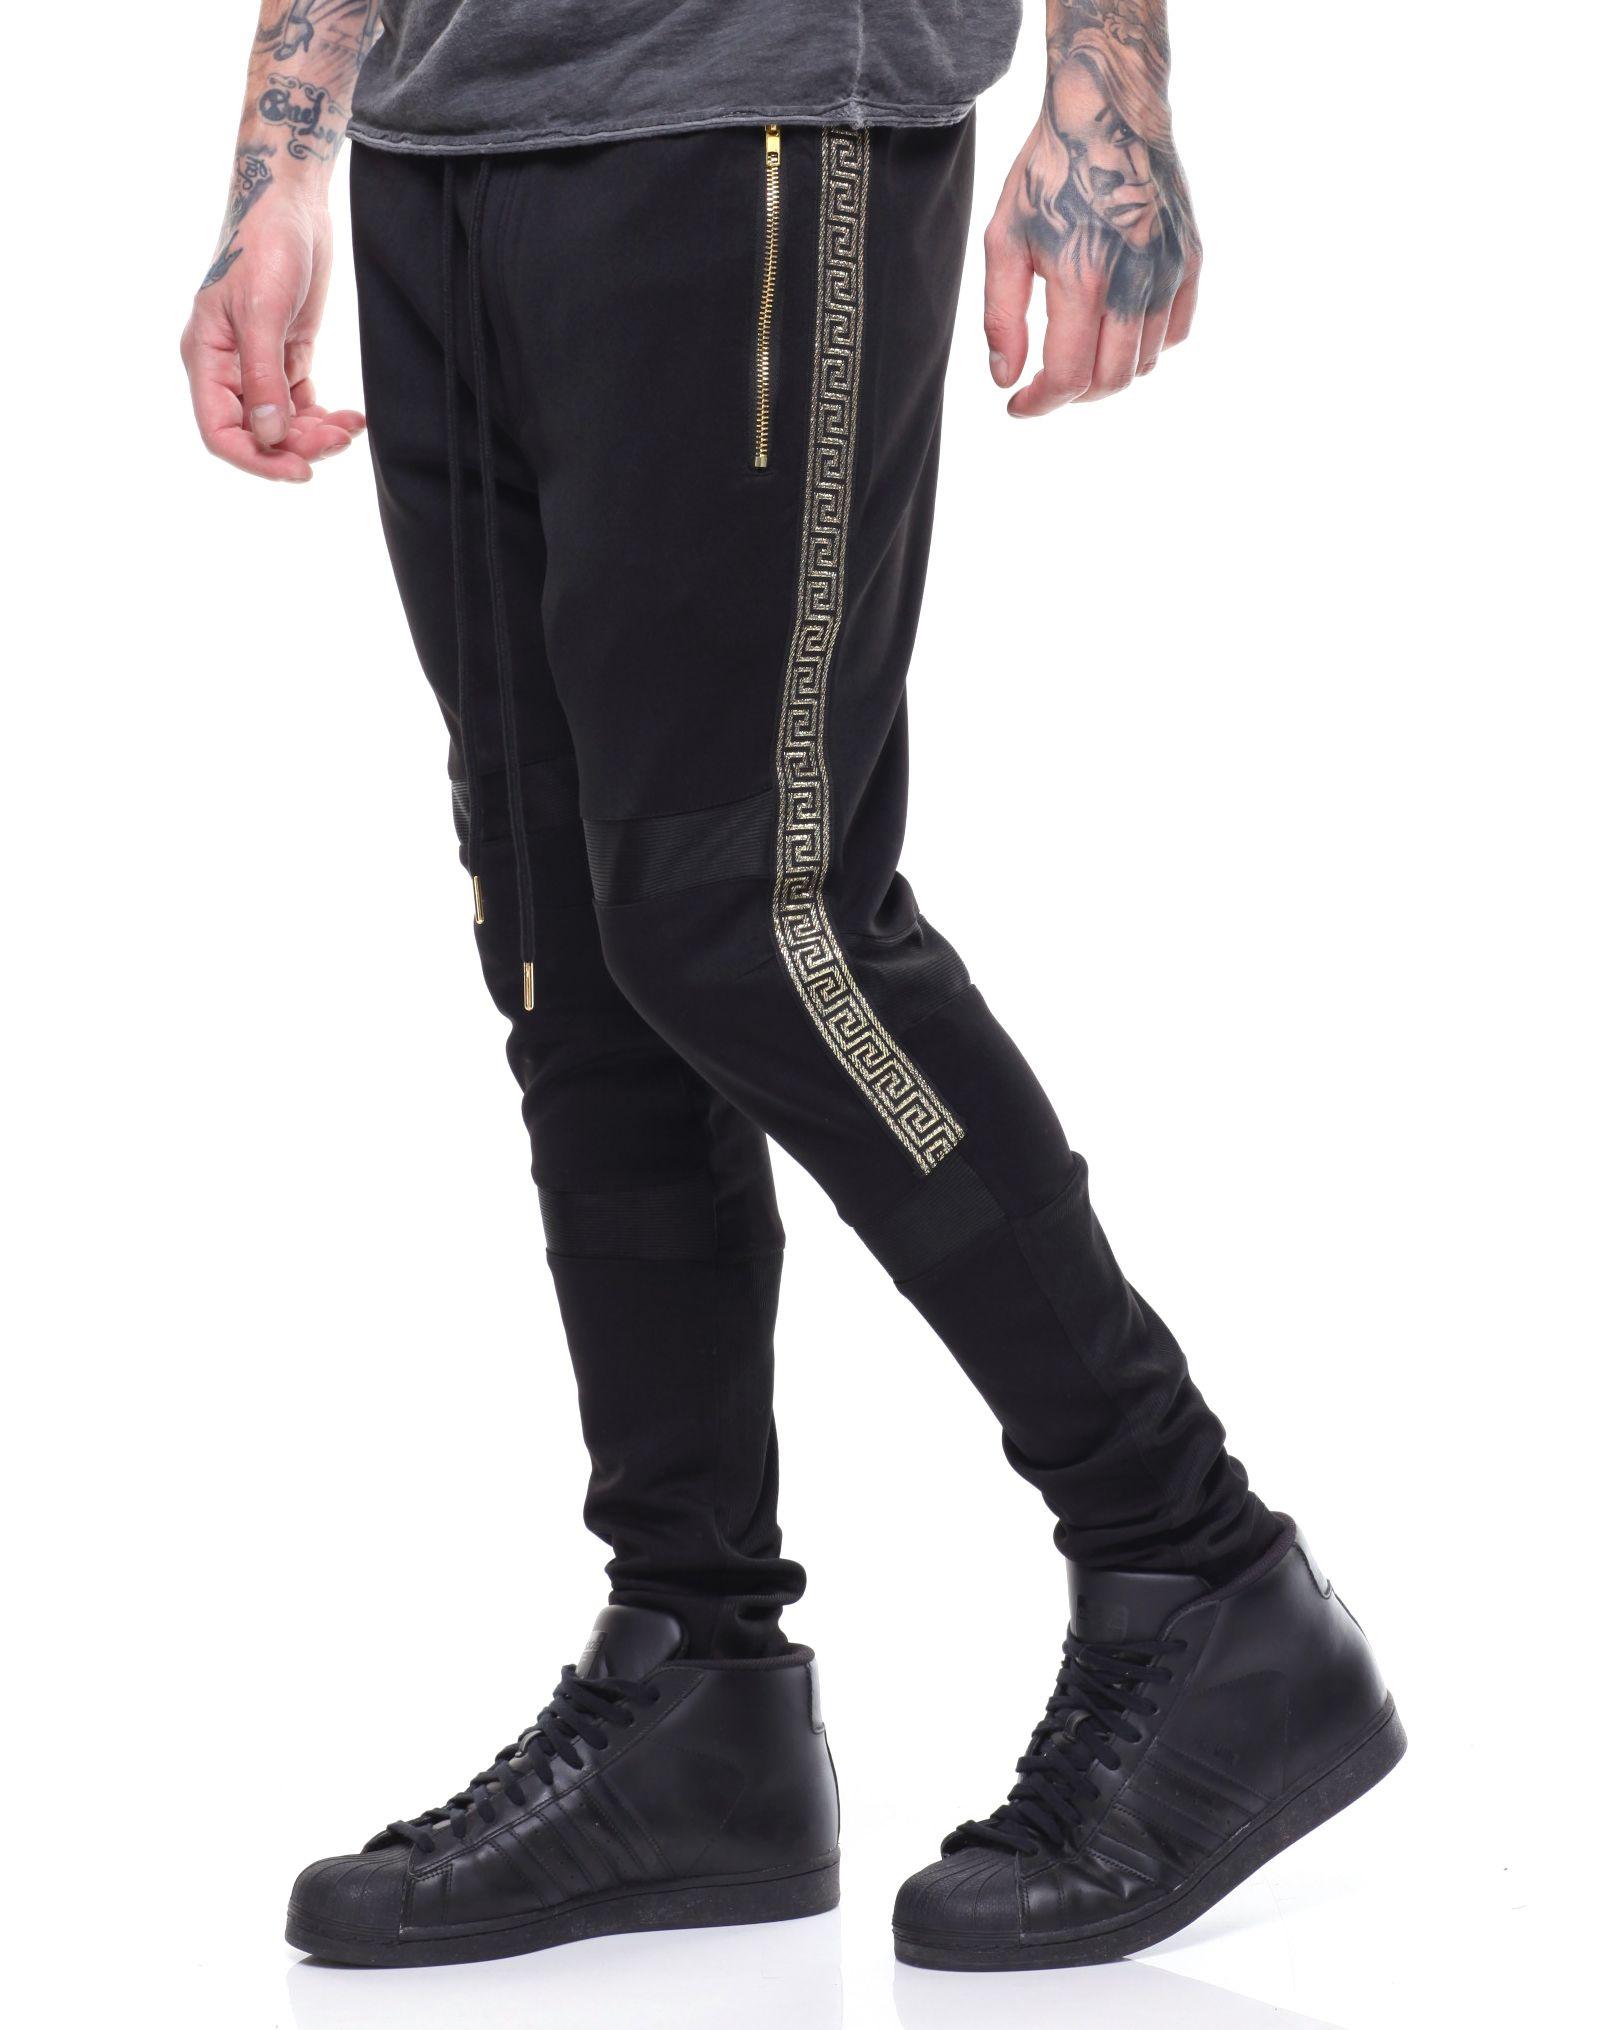 0d3fc6f977f46 GREEK KEY JOGGER Men's Jeans & Pants from Buyers Picks. Find Buyers Picks  fashion & more at DrJays.com